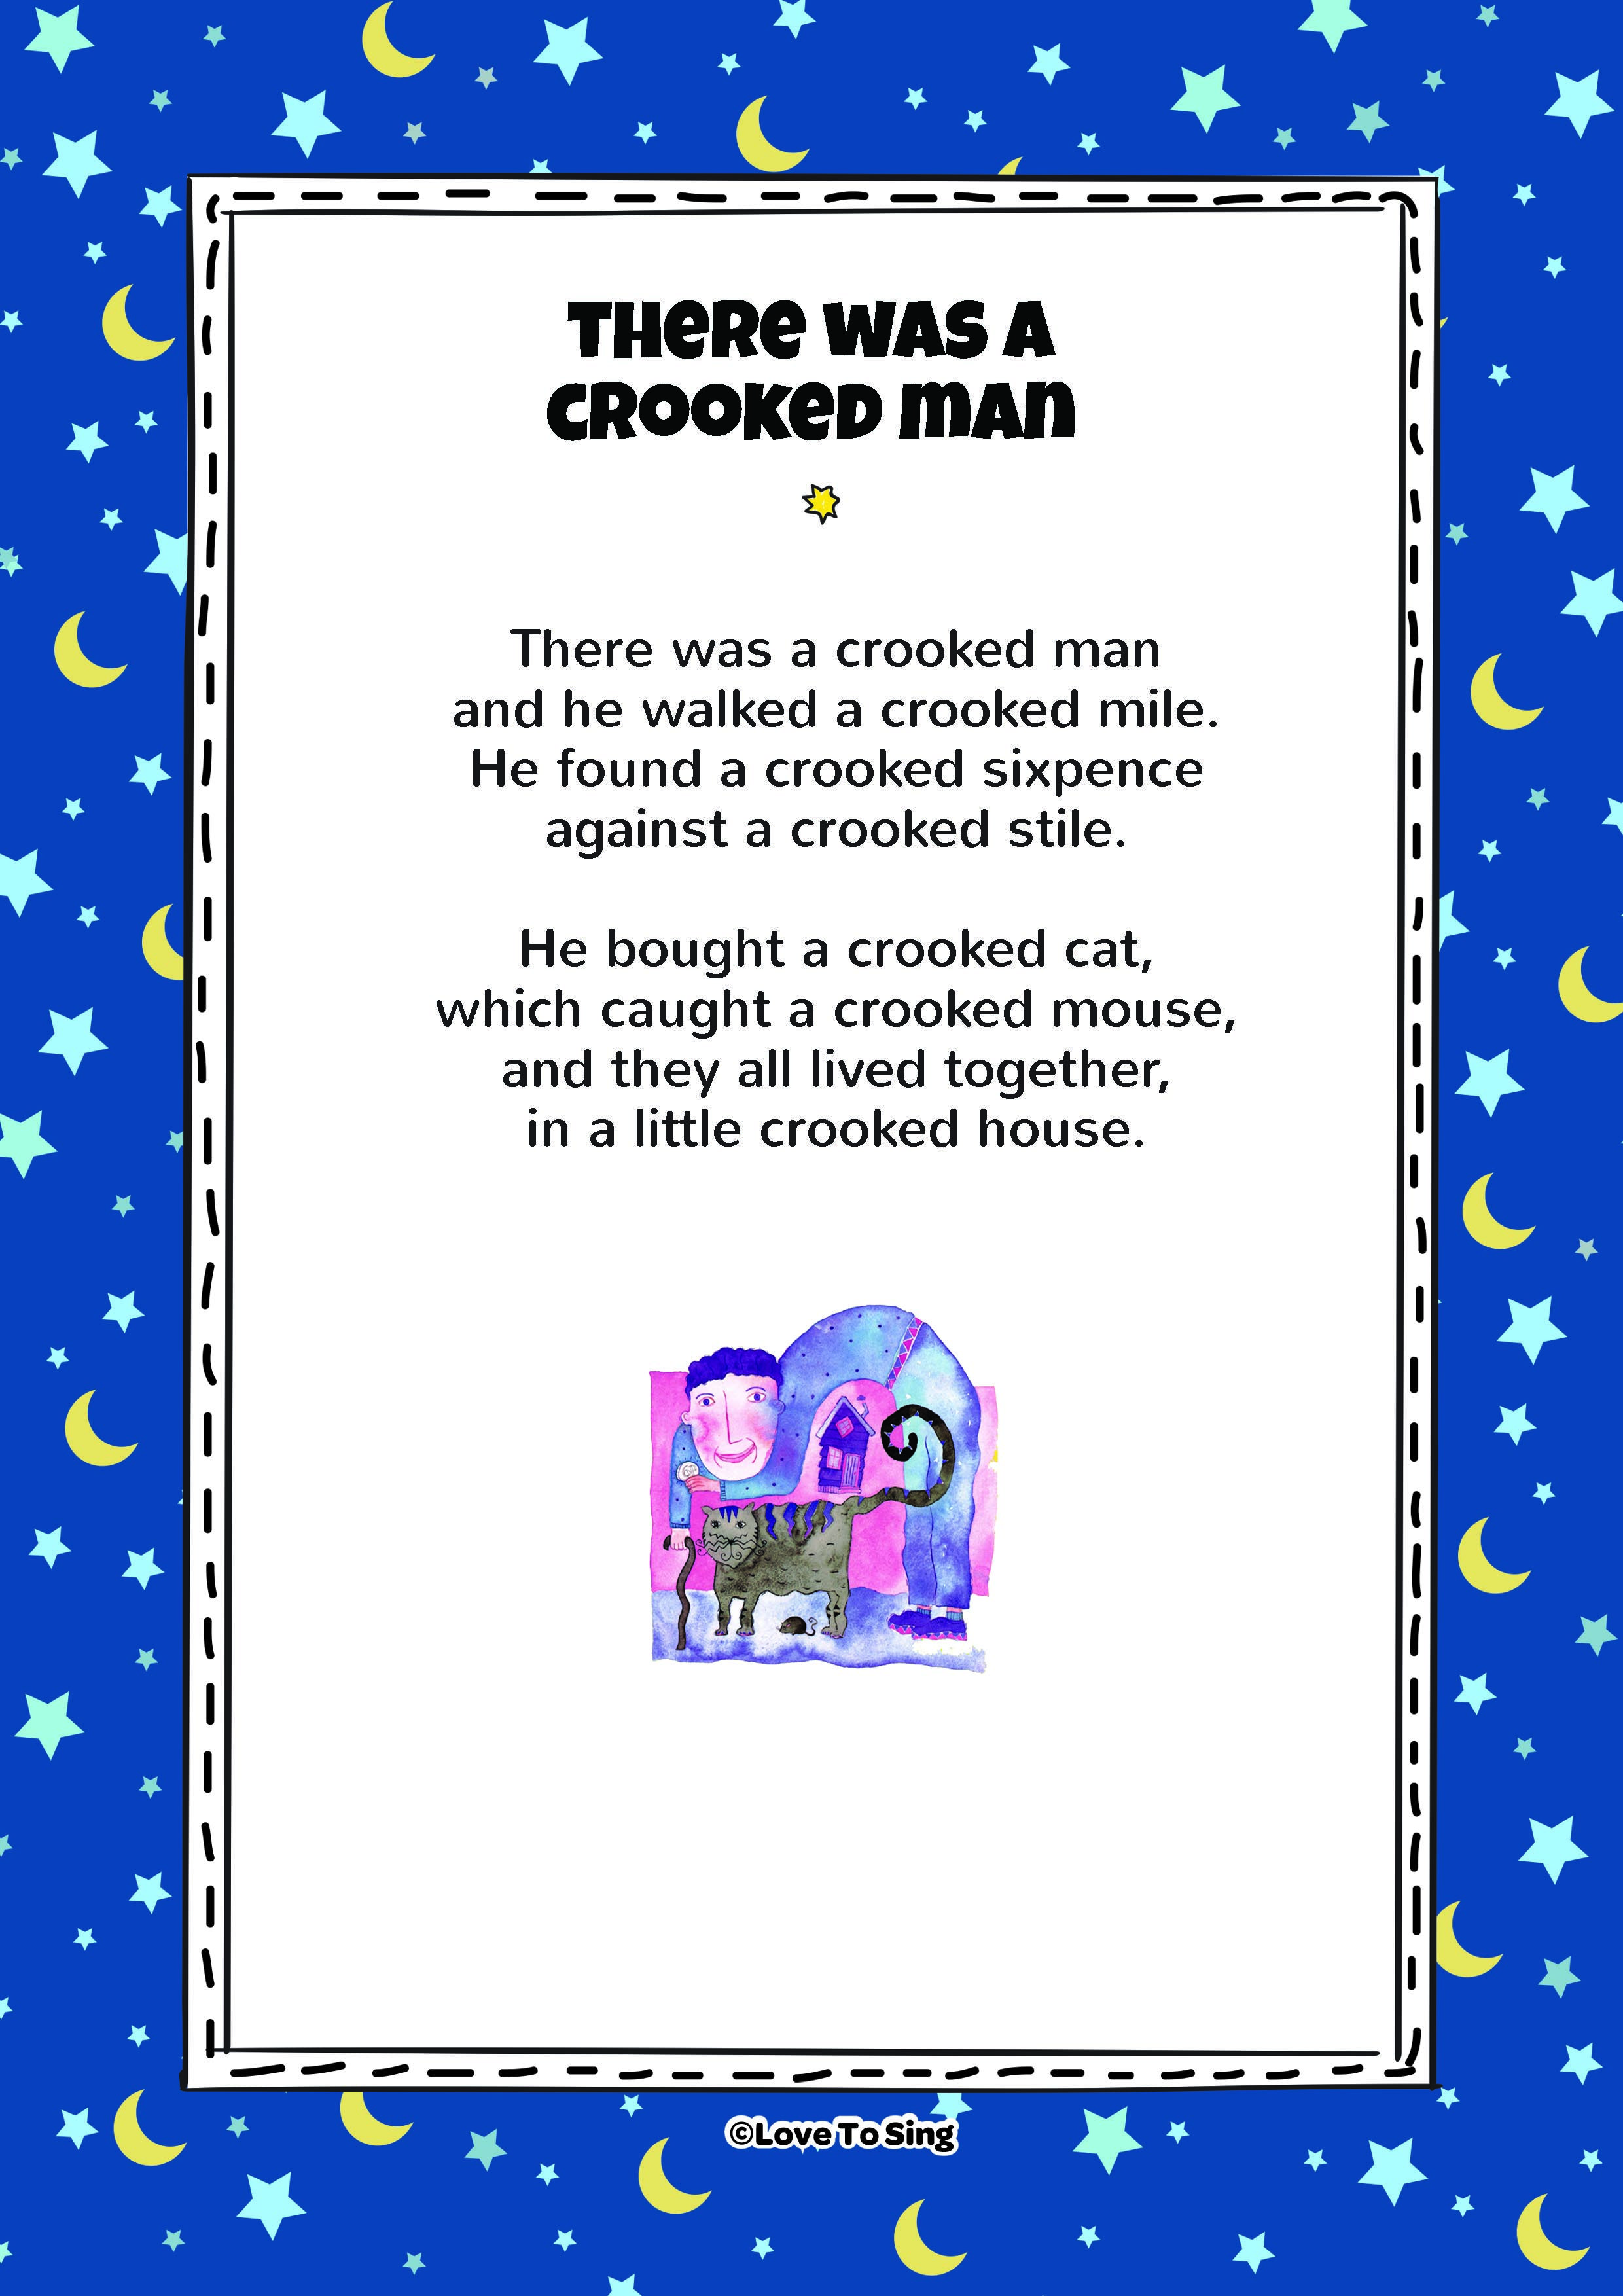 Nursery Rhyme There Was A Crooked Man Kids Will Love This Fun Sing Along Free Lyricusic On Our Website Lovetosing Nurseryrhymes Freelyrics